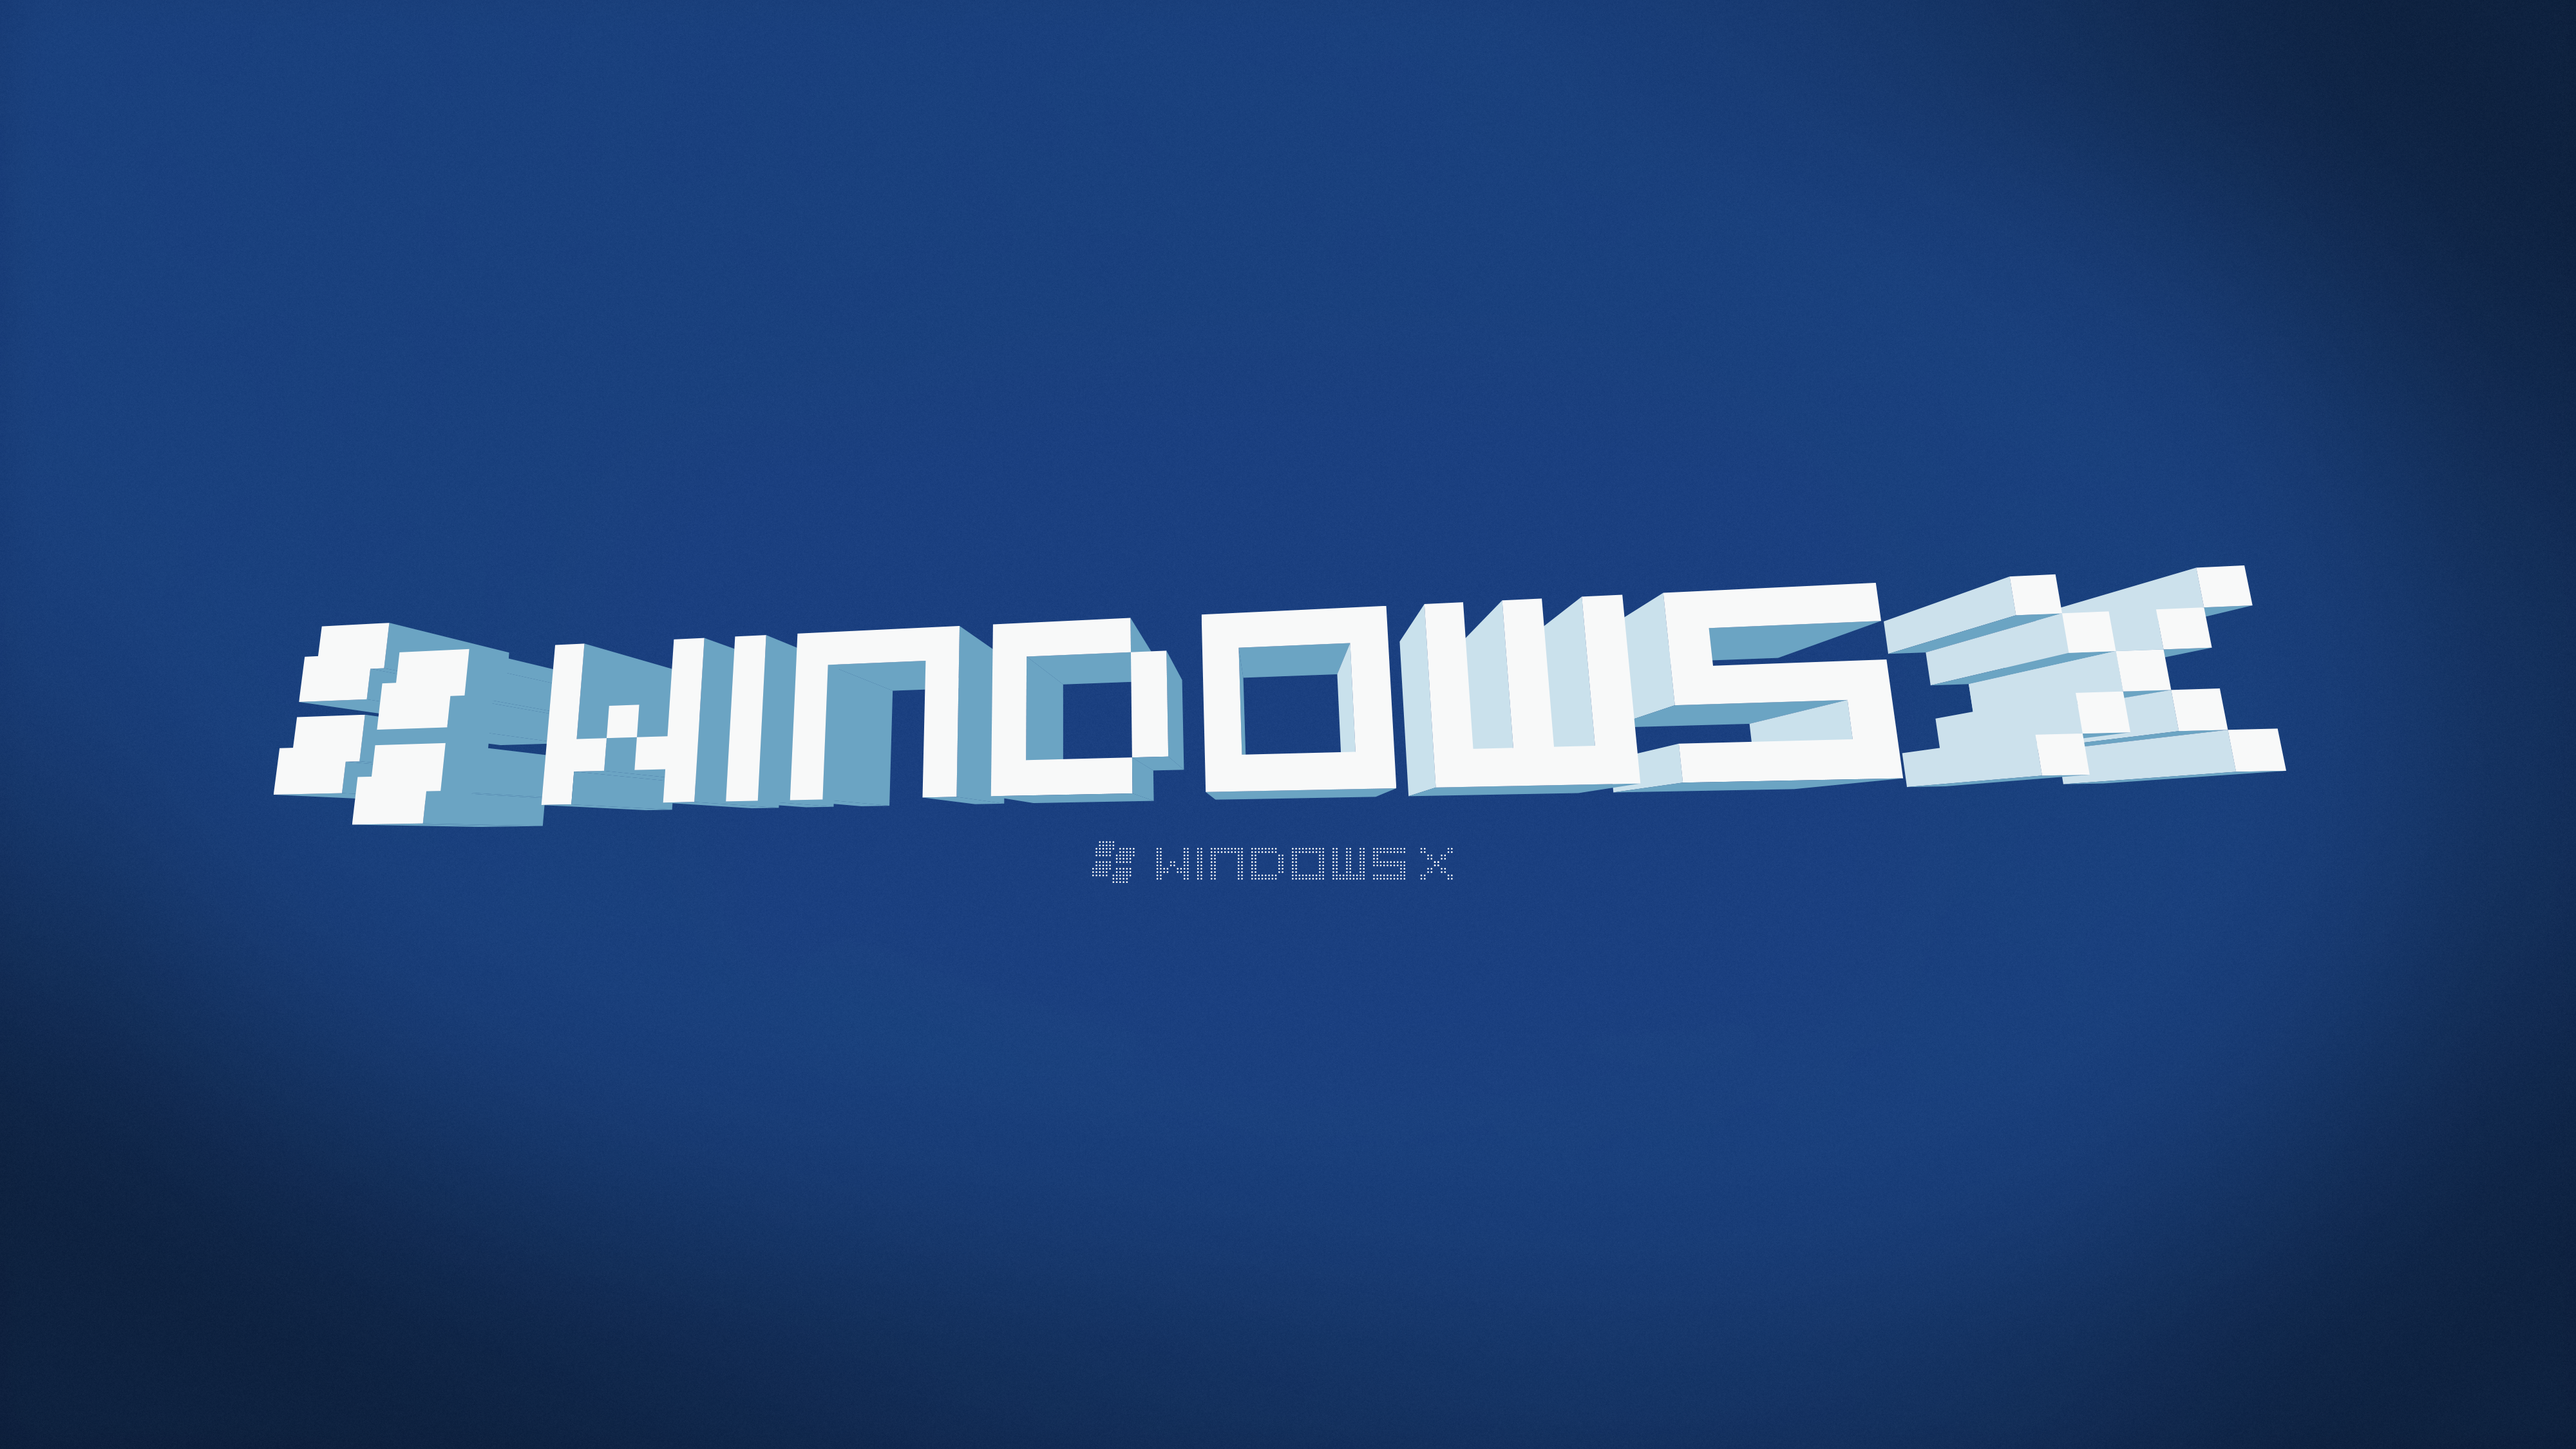 Windows 10 3d 4k Ultra Papel De Parede HD